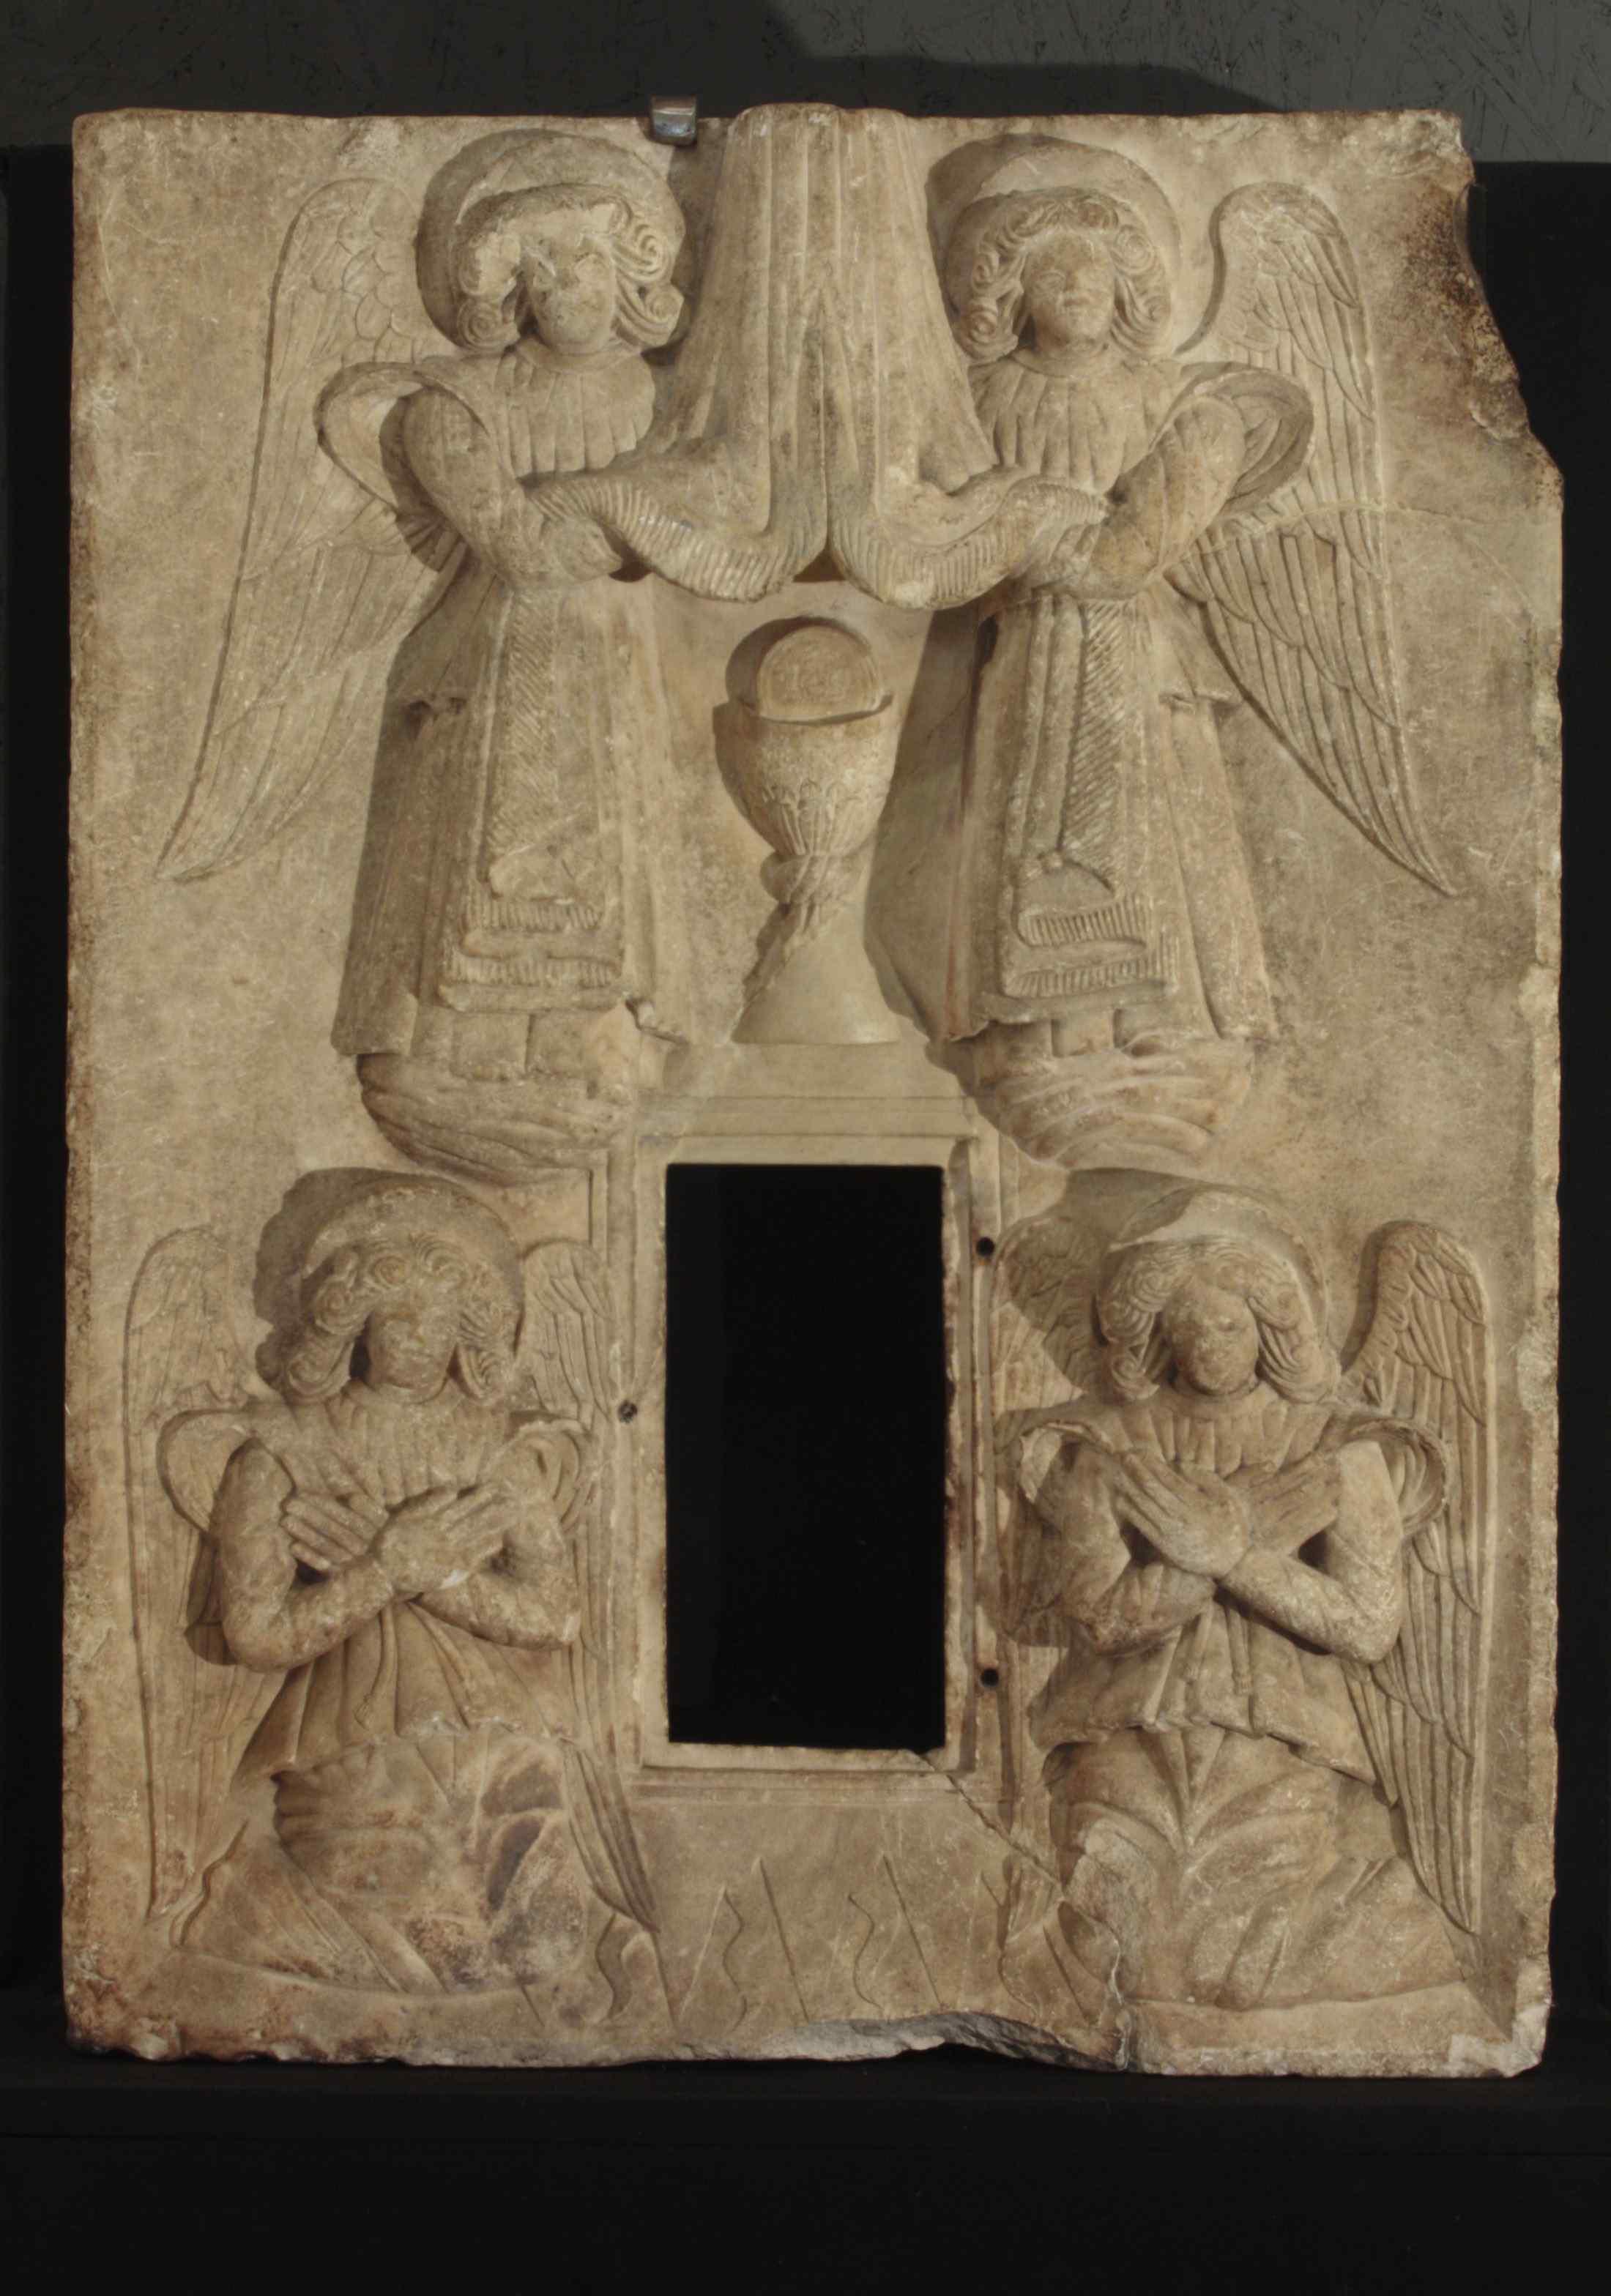 Stone tabernacle, Abruzzo, 15th century